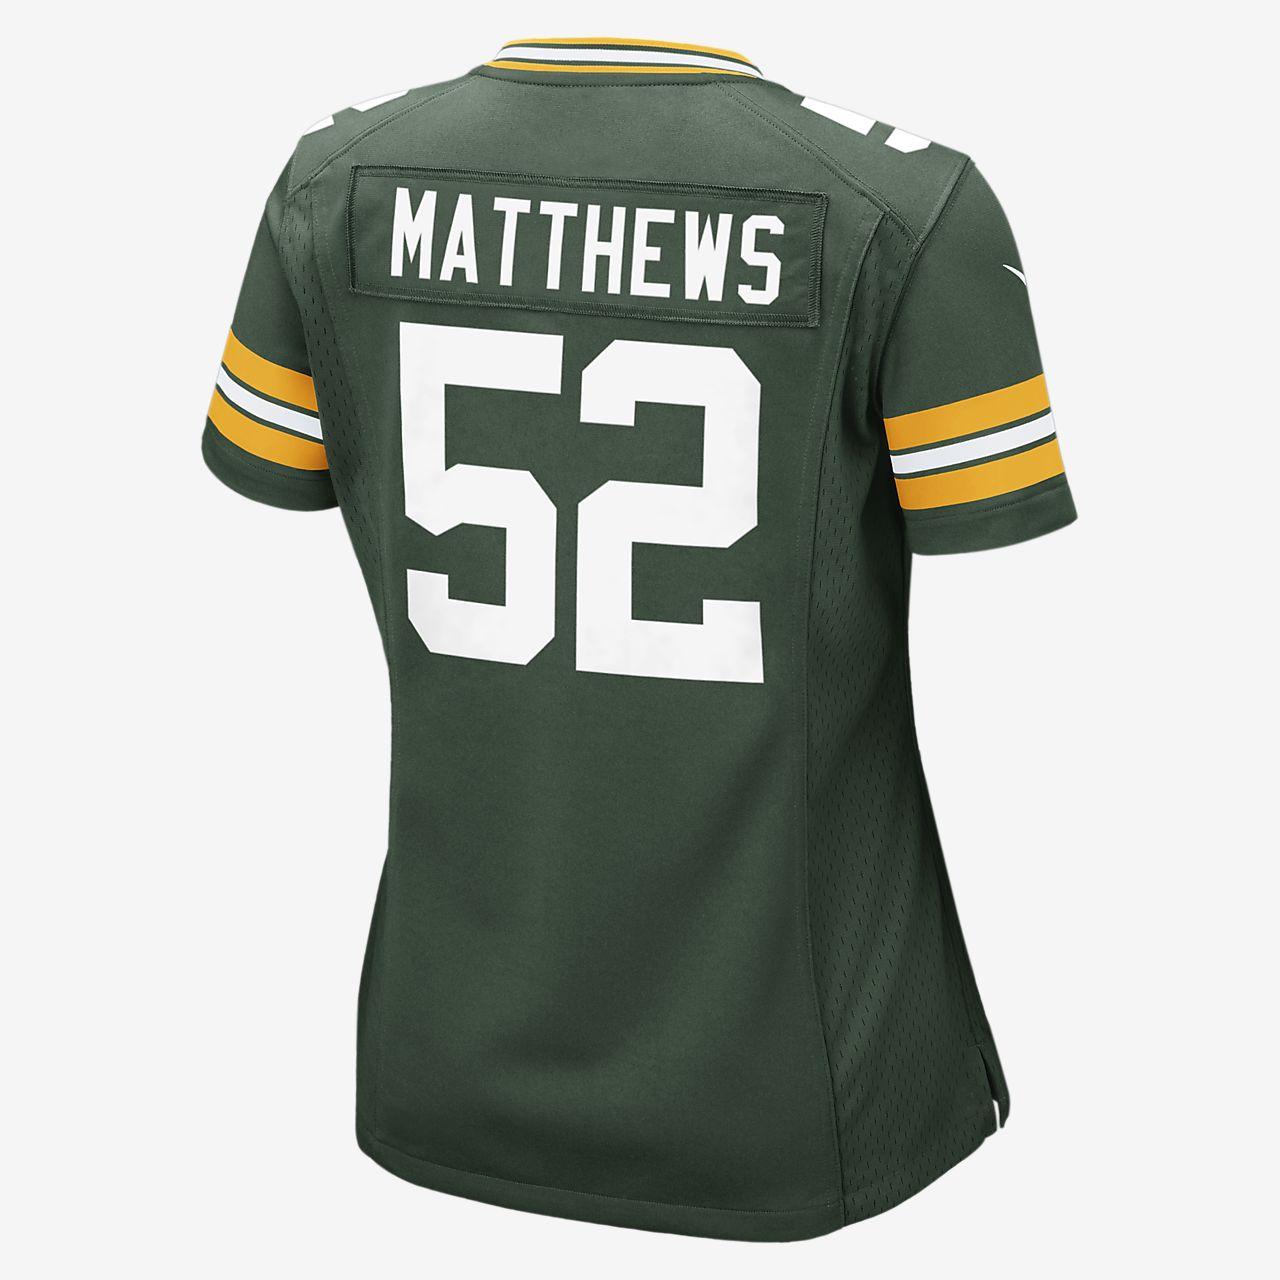 ... NFL Green Bay Packers (Clay Matthews) Women s Football Home Game Jersey e0baba263